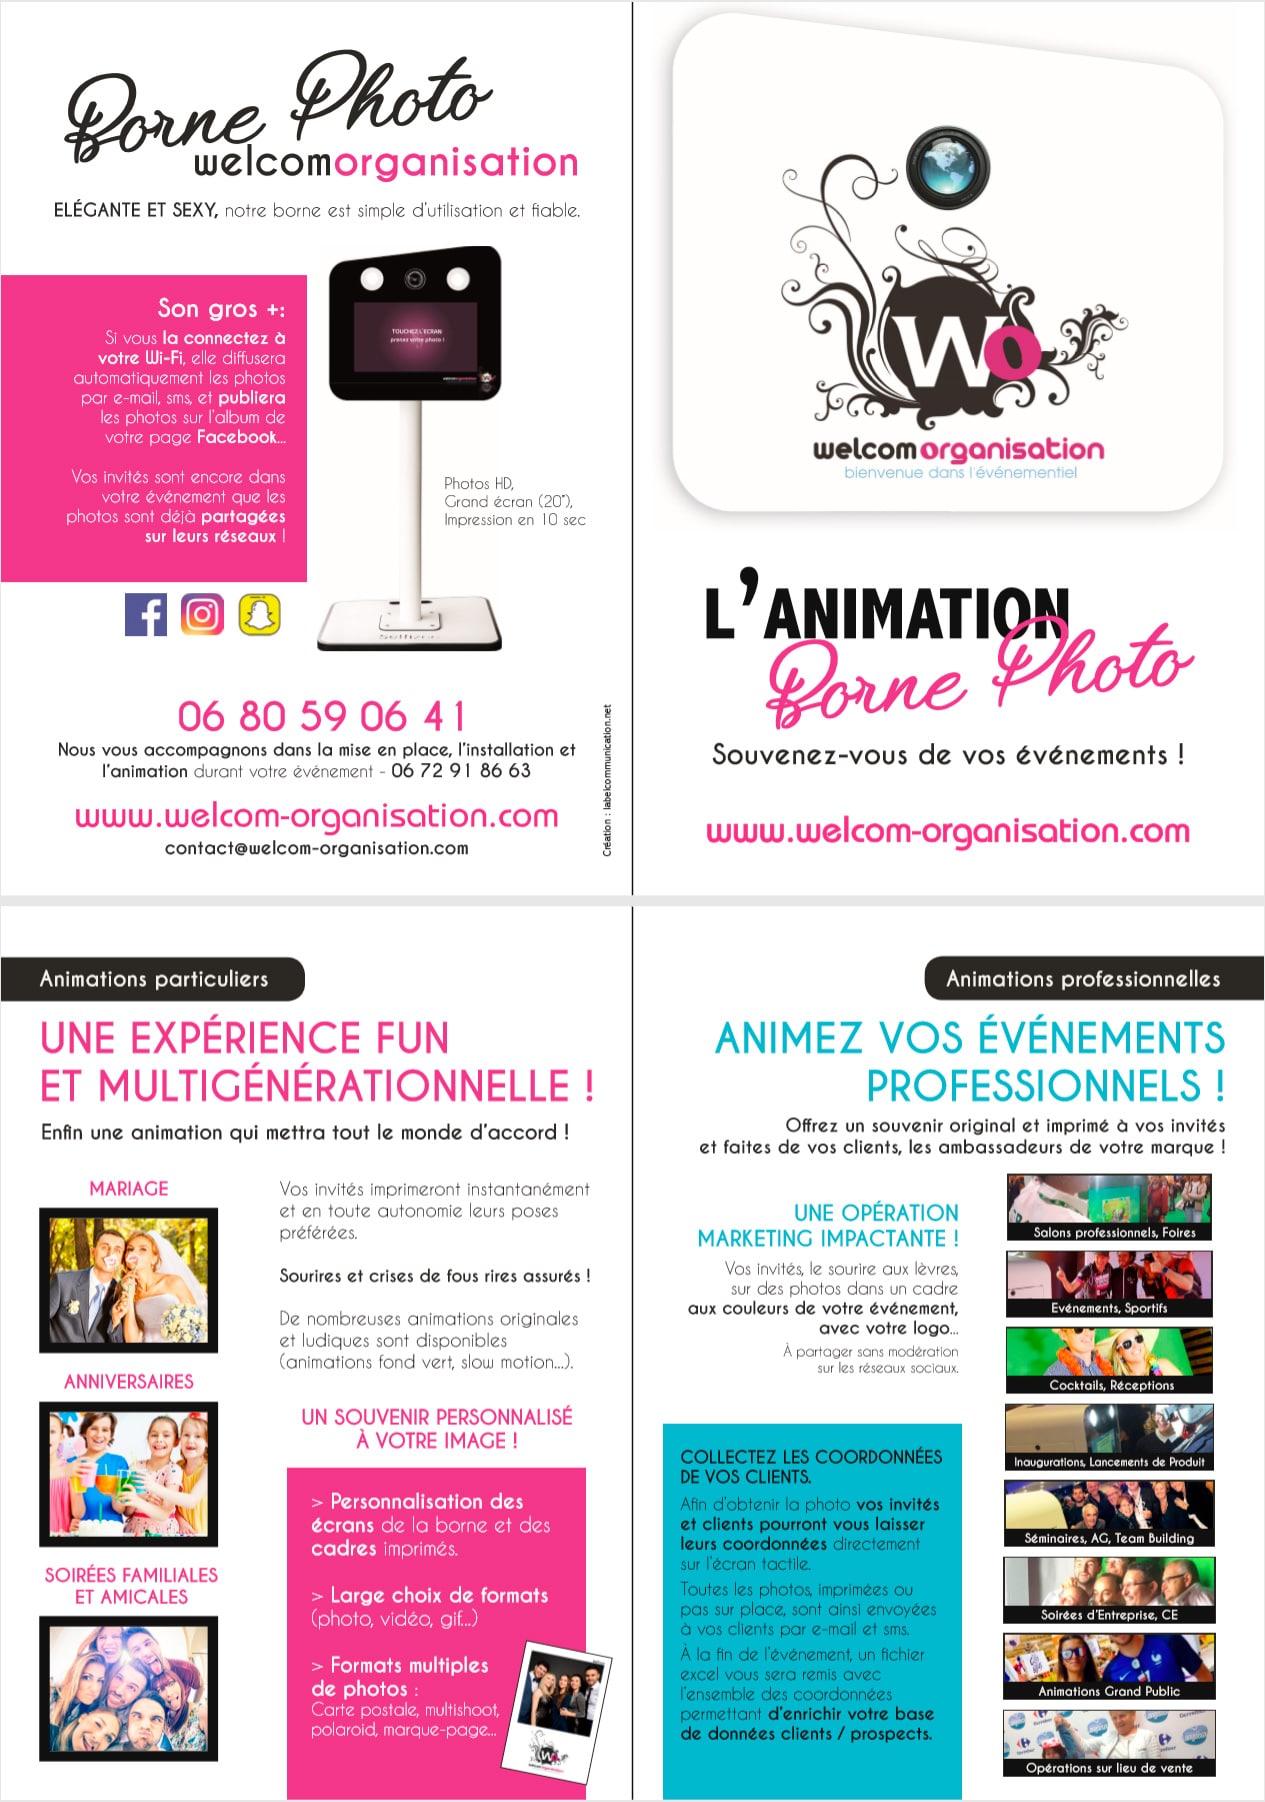 welcom-organisation-borne-photo